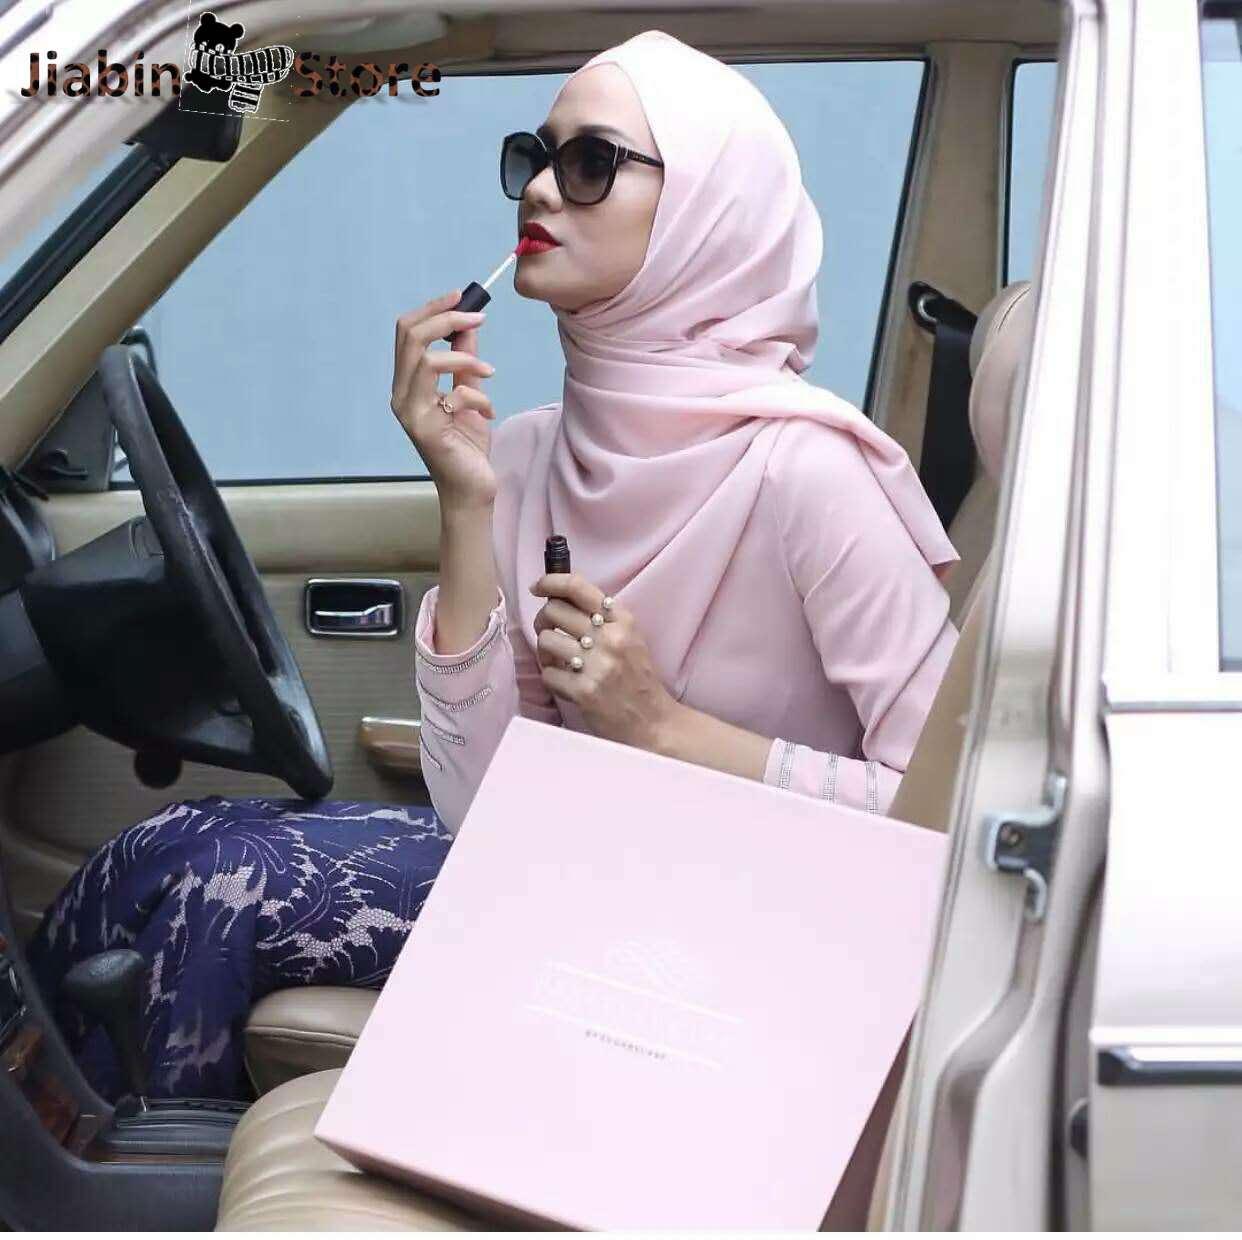 Luxo macio bolha chiffon muçulmano envoltório xale cabeça cachecol femme mussulman imediato hijab liso islâmico árabe turbante foulard